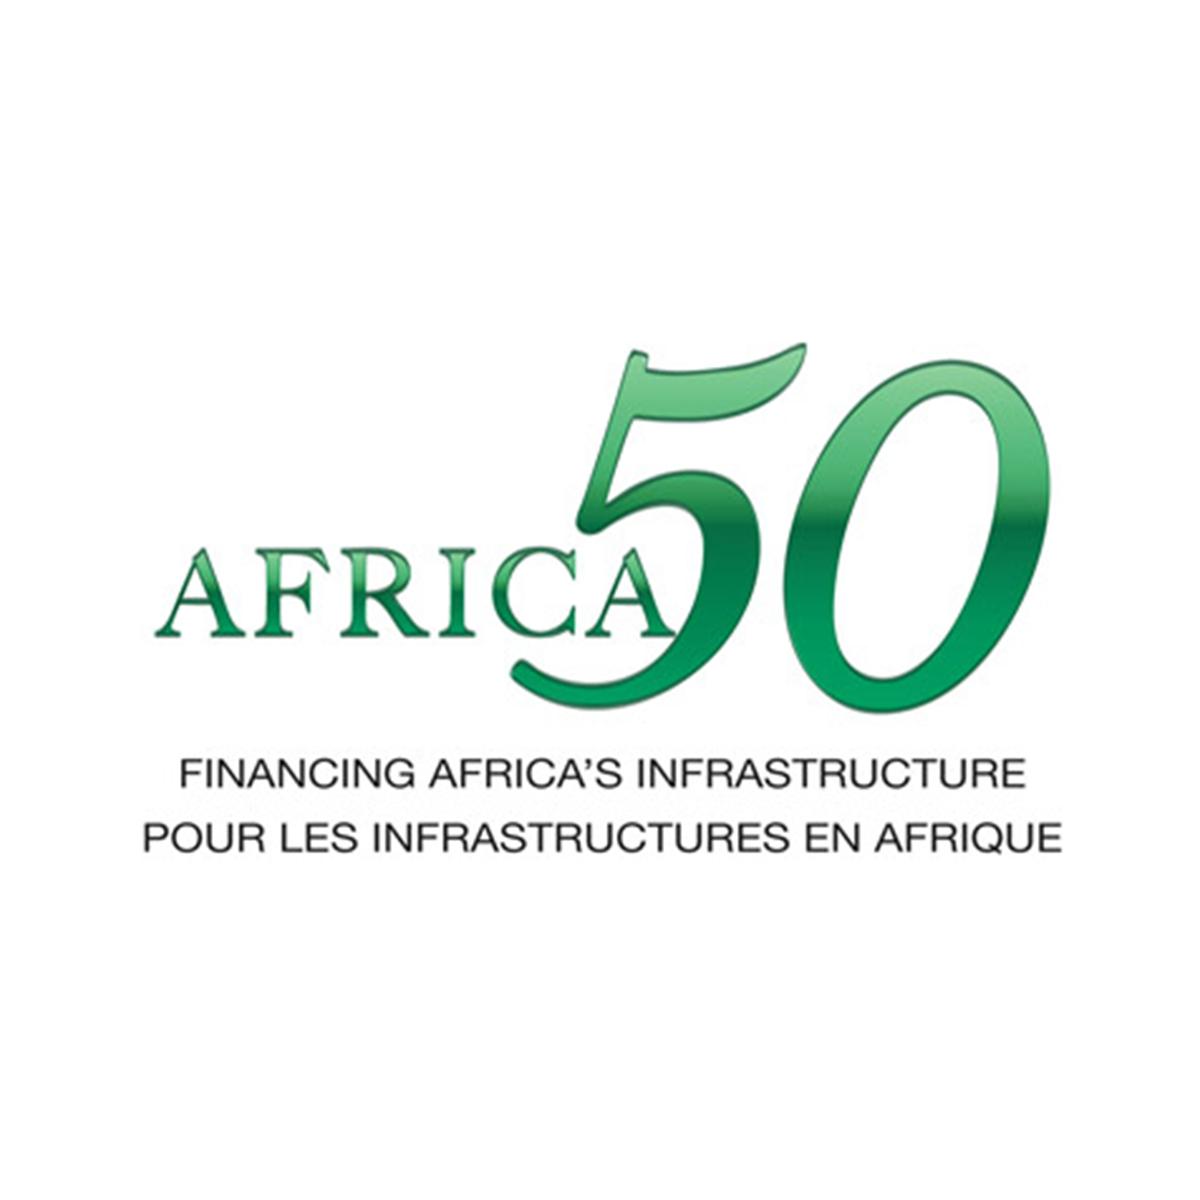 logo2_africa50.png